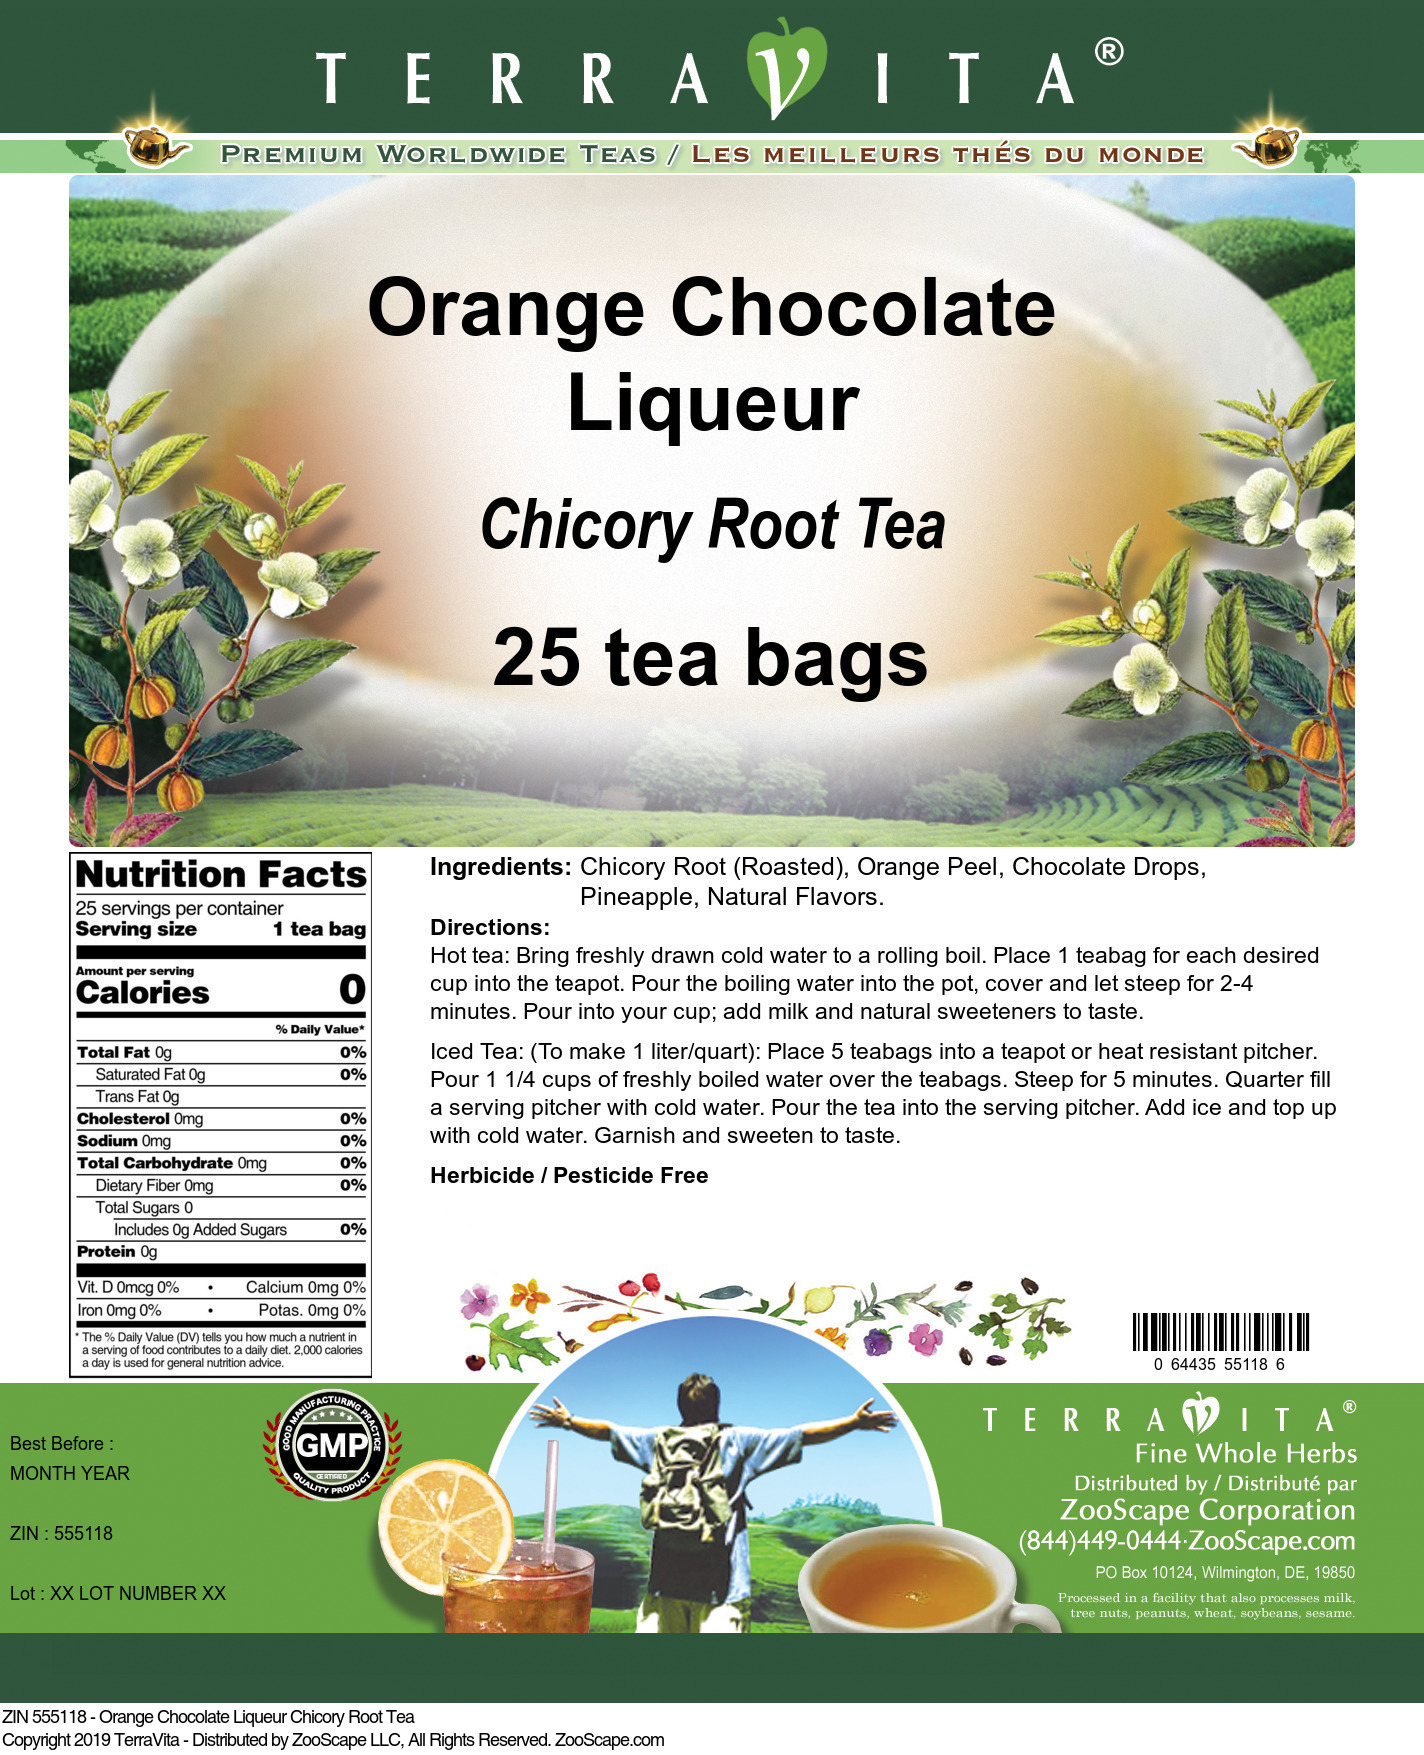 Orange Chocolate Liqueur Chicory Root